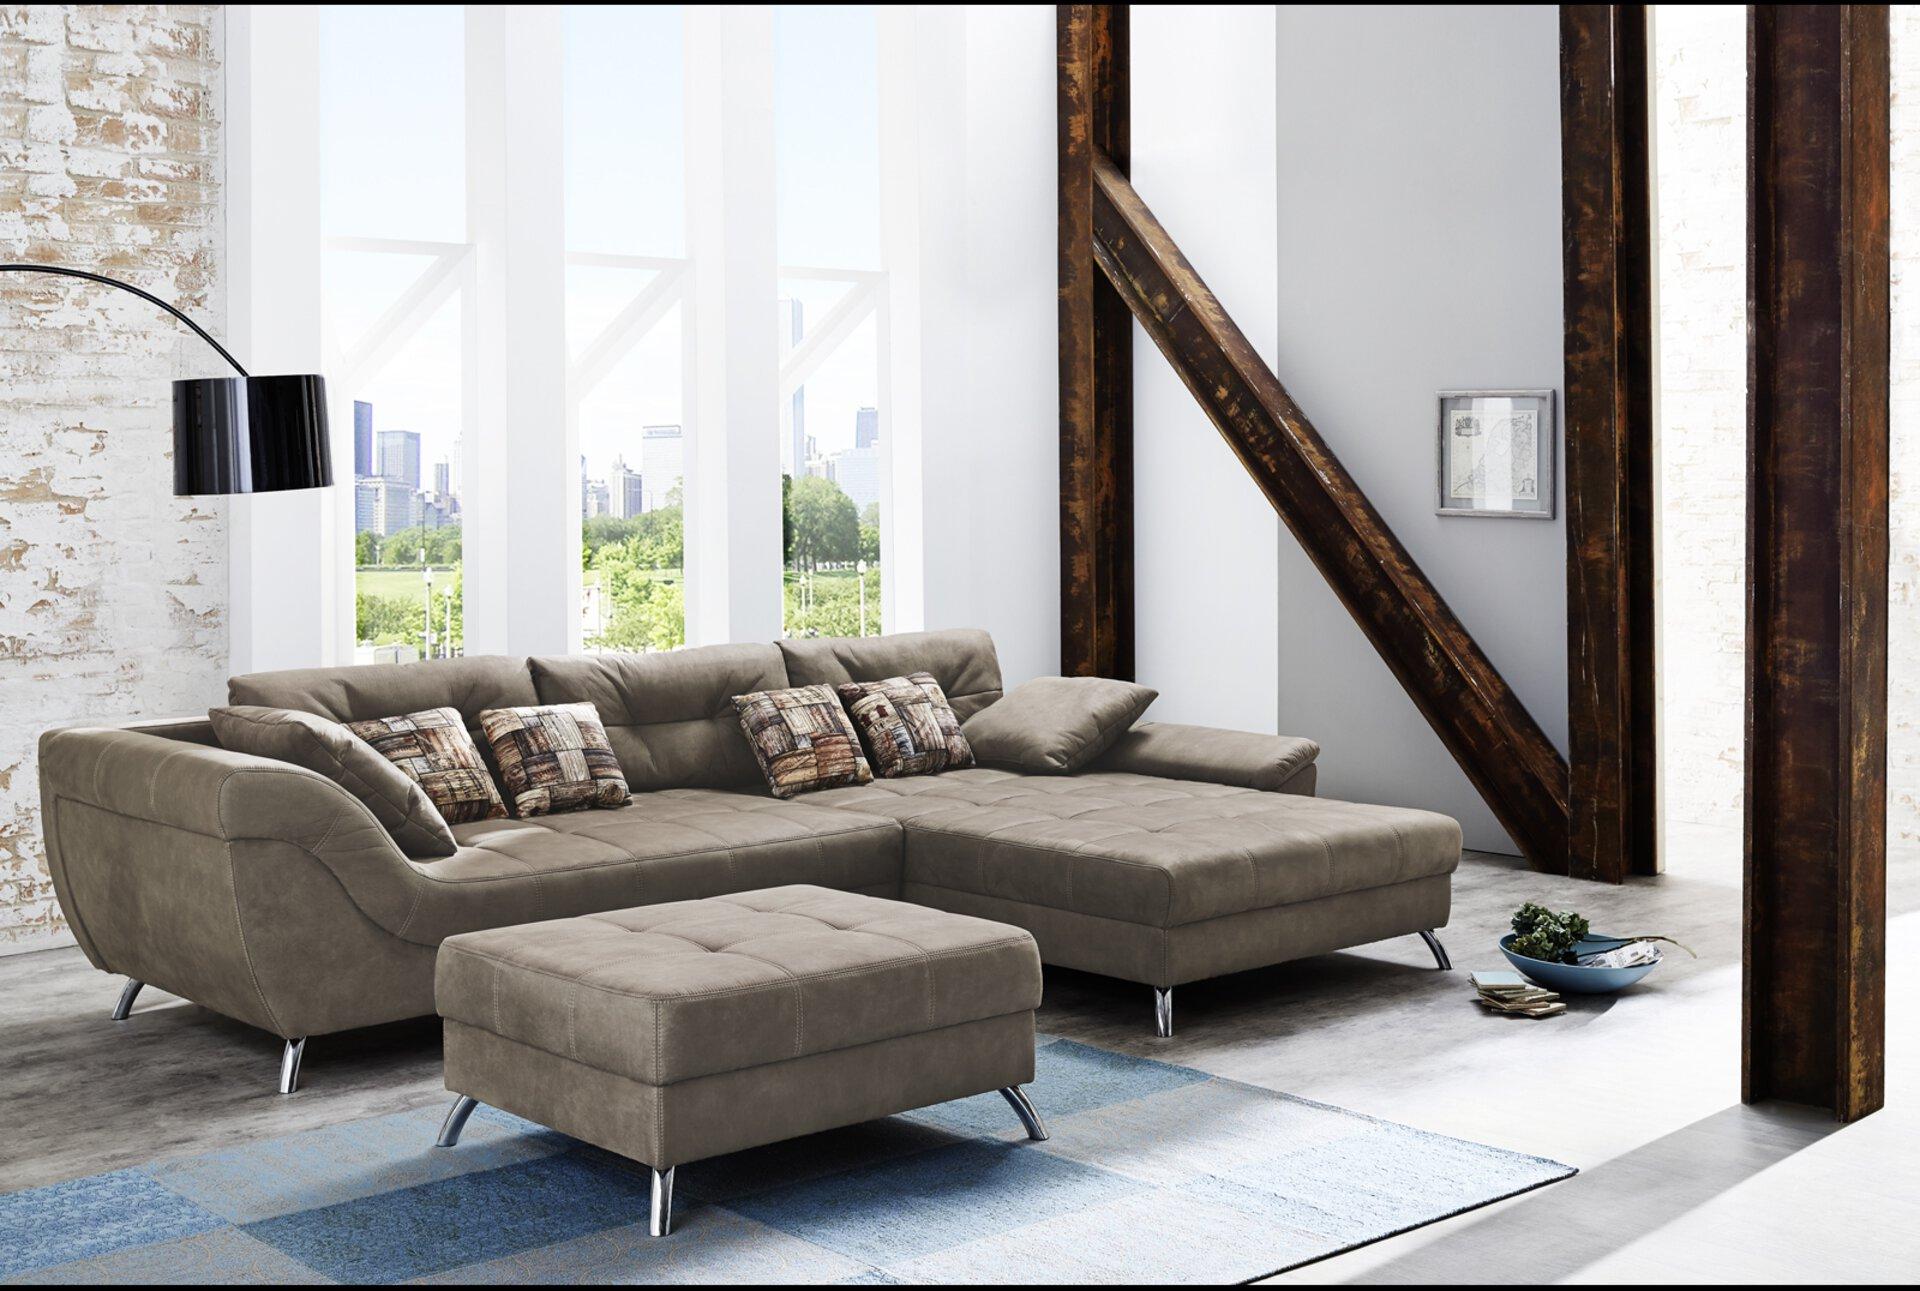 Hocker SAN FRANCISCO-SE CELECT Textil braun 86 x 44 x 103 cm